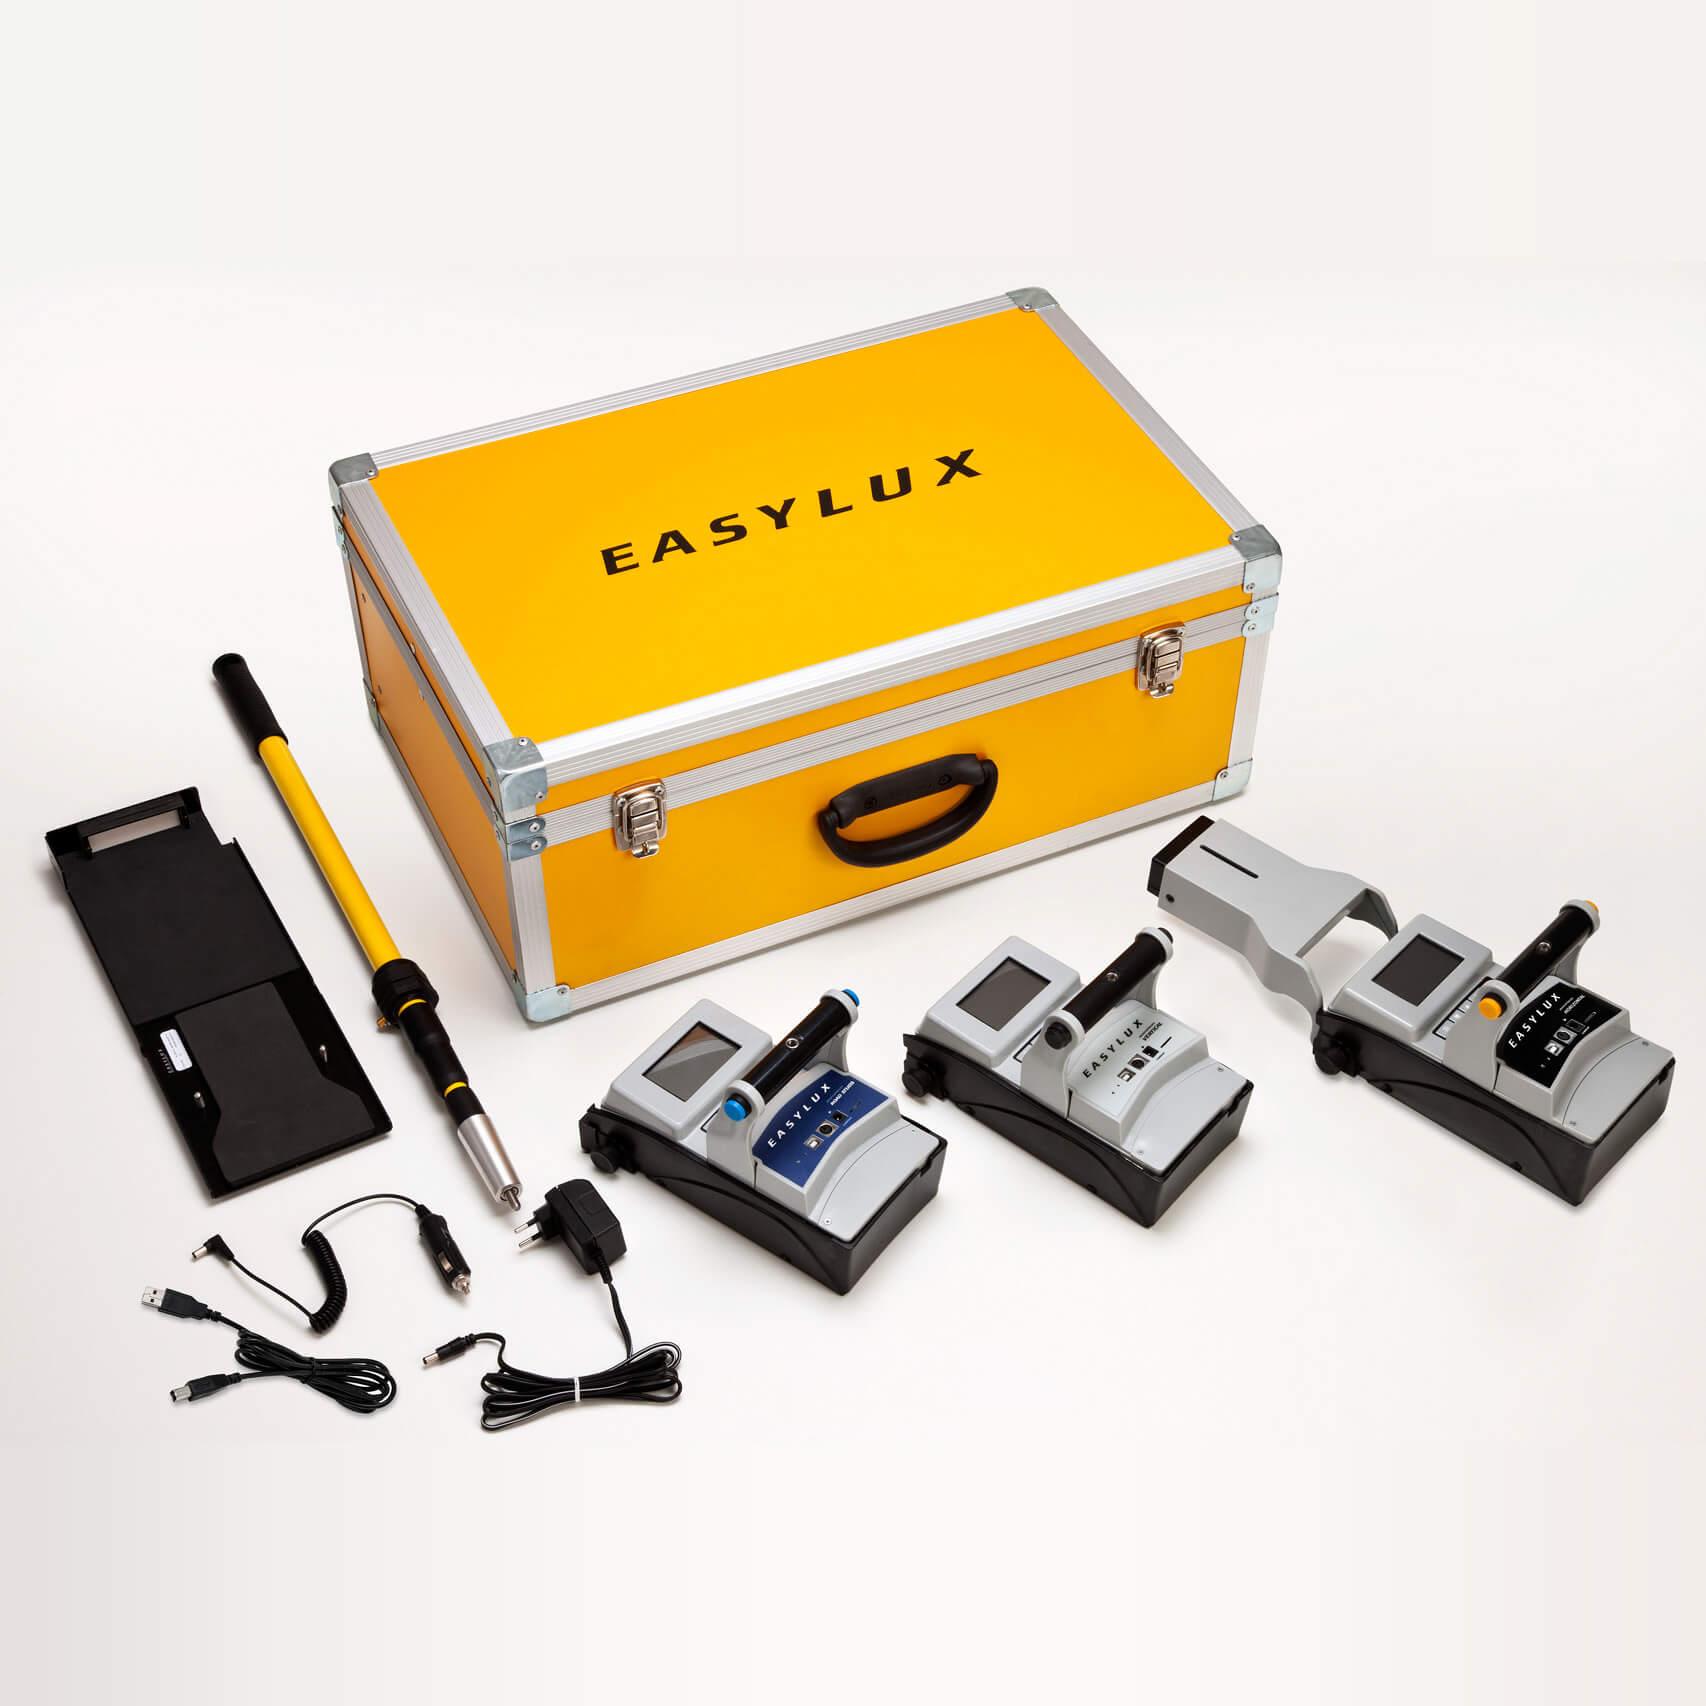 Retroreflectometer Equipment to measure RA